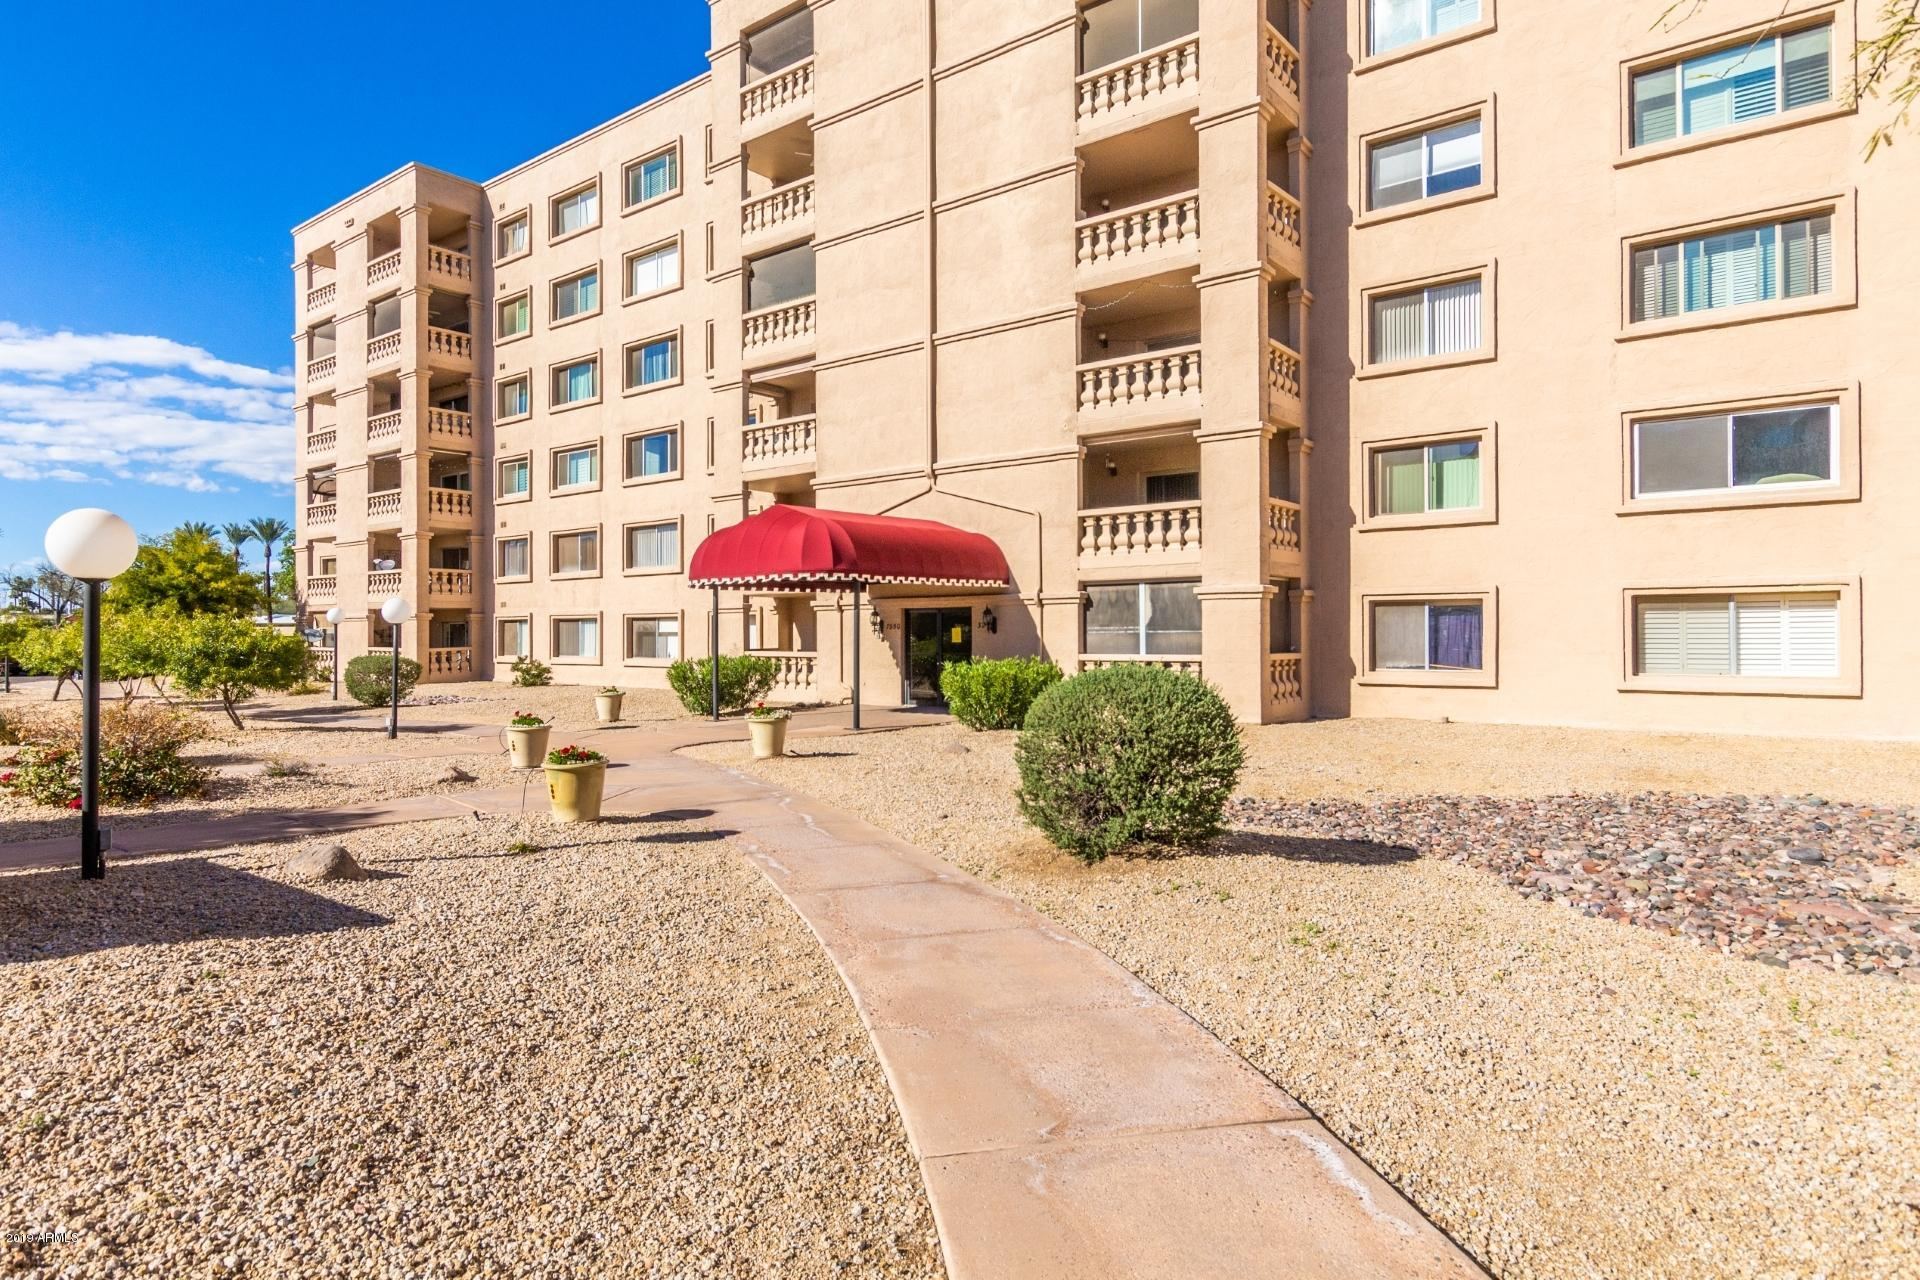 Photo of 7850 E CAMELBACK Road #202, Scottsdale, AZ 85251